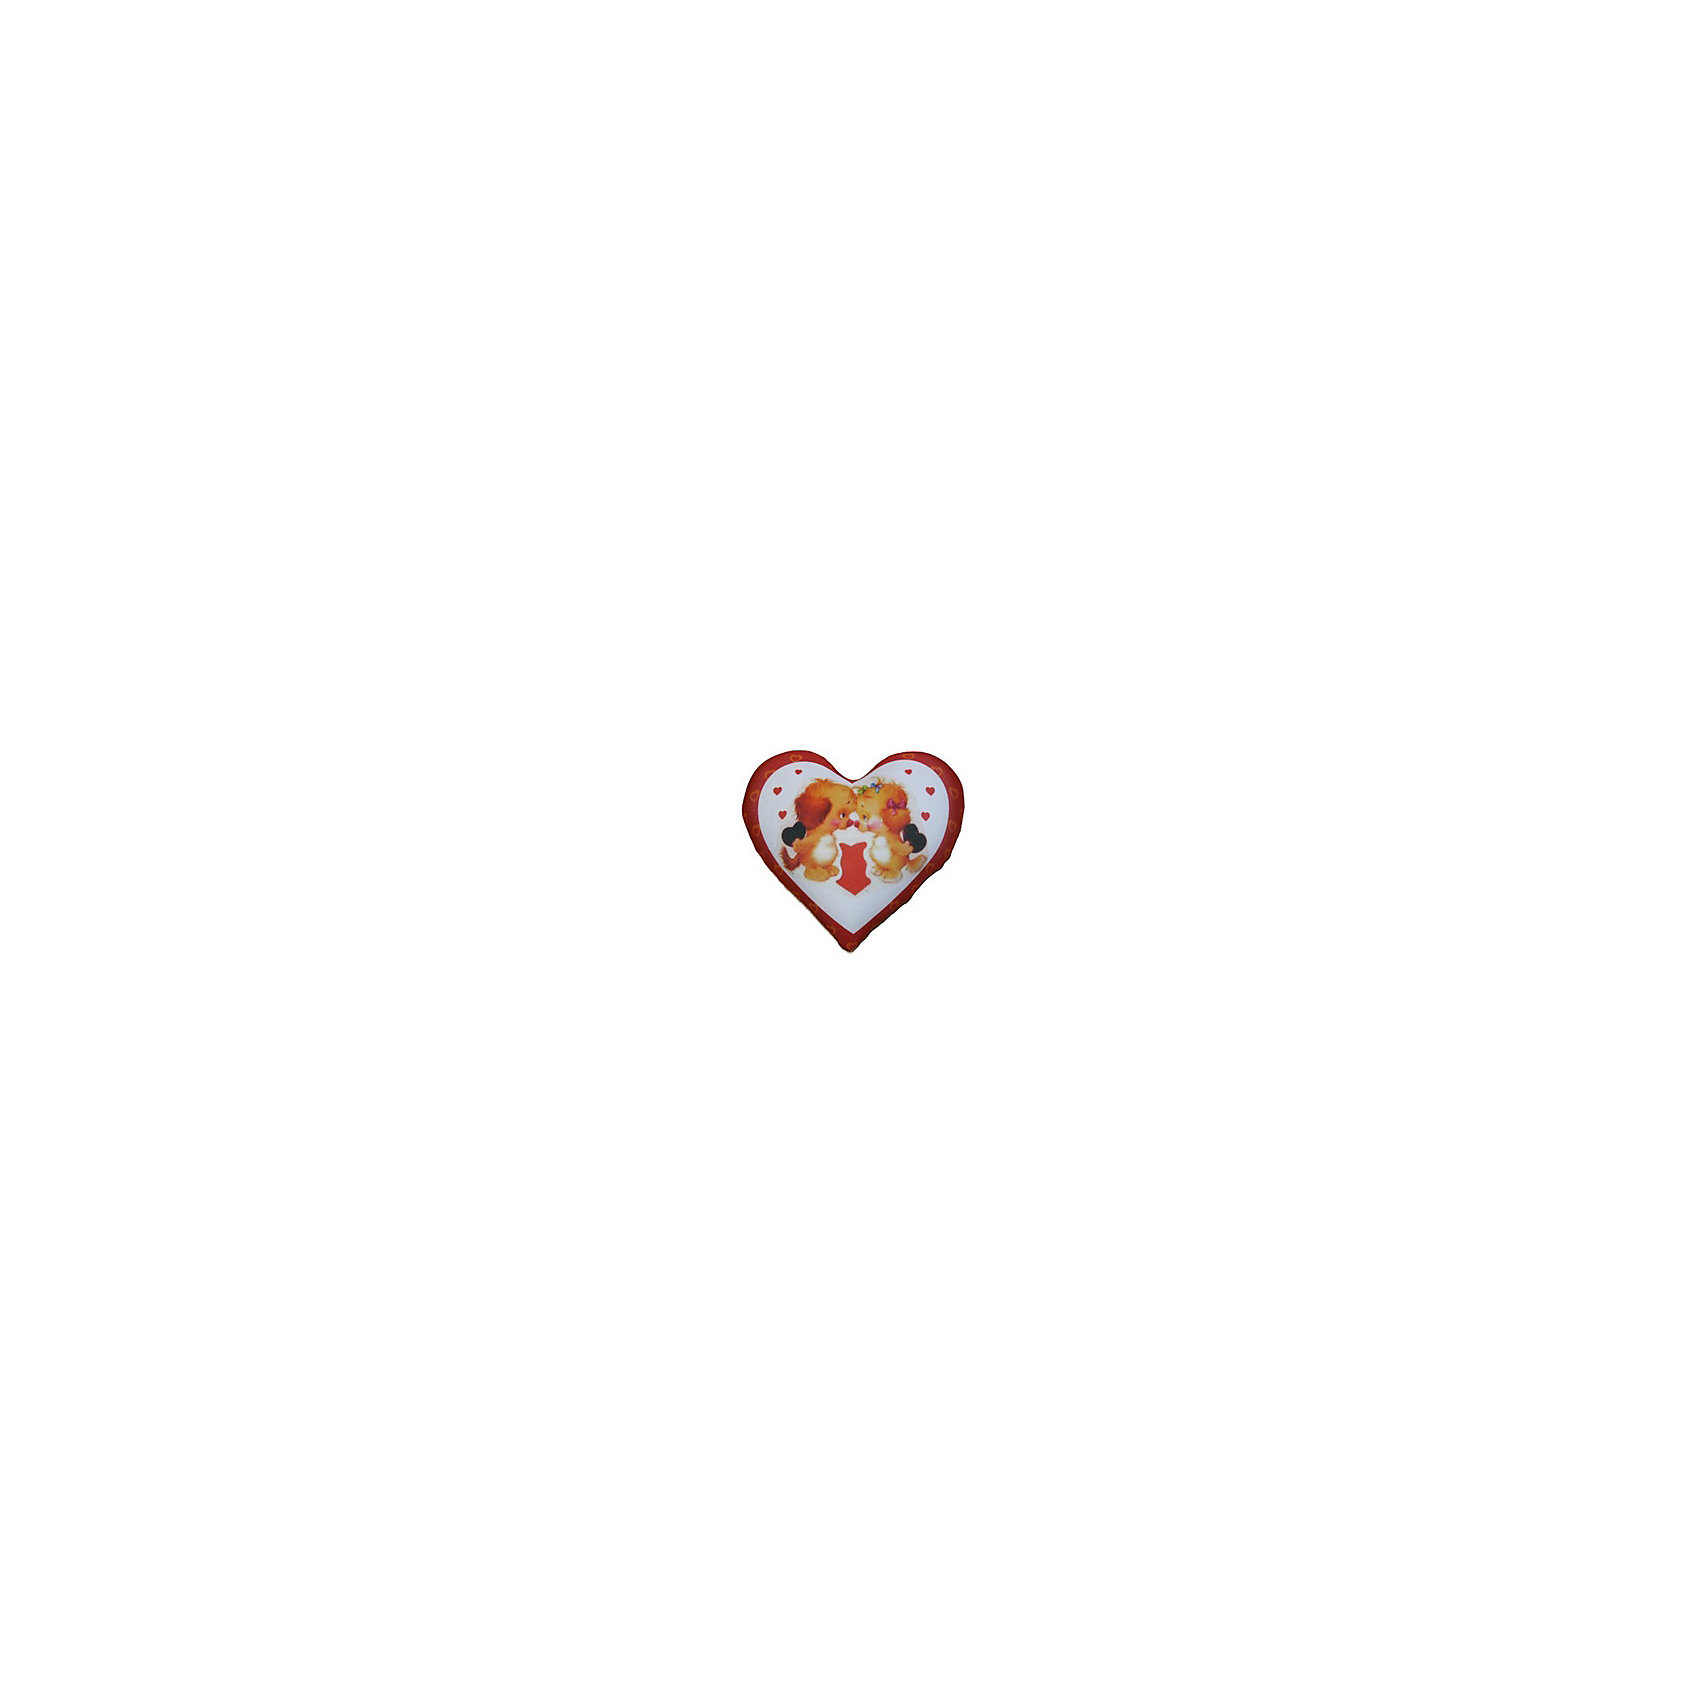 Валентинка-антистресс В18 см, арт. 2585/КР-6